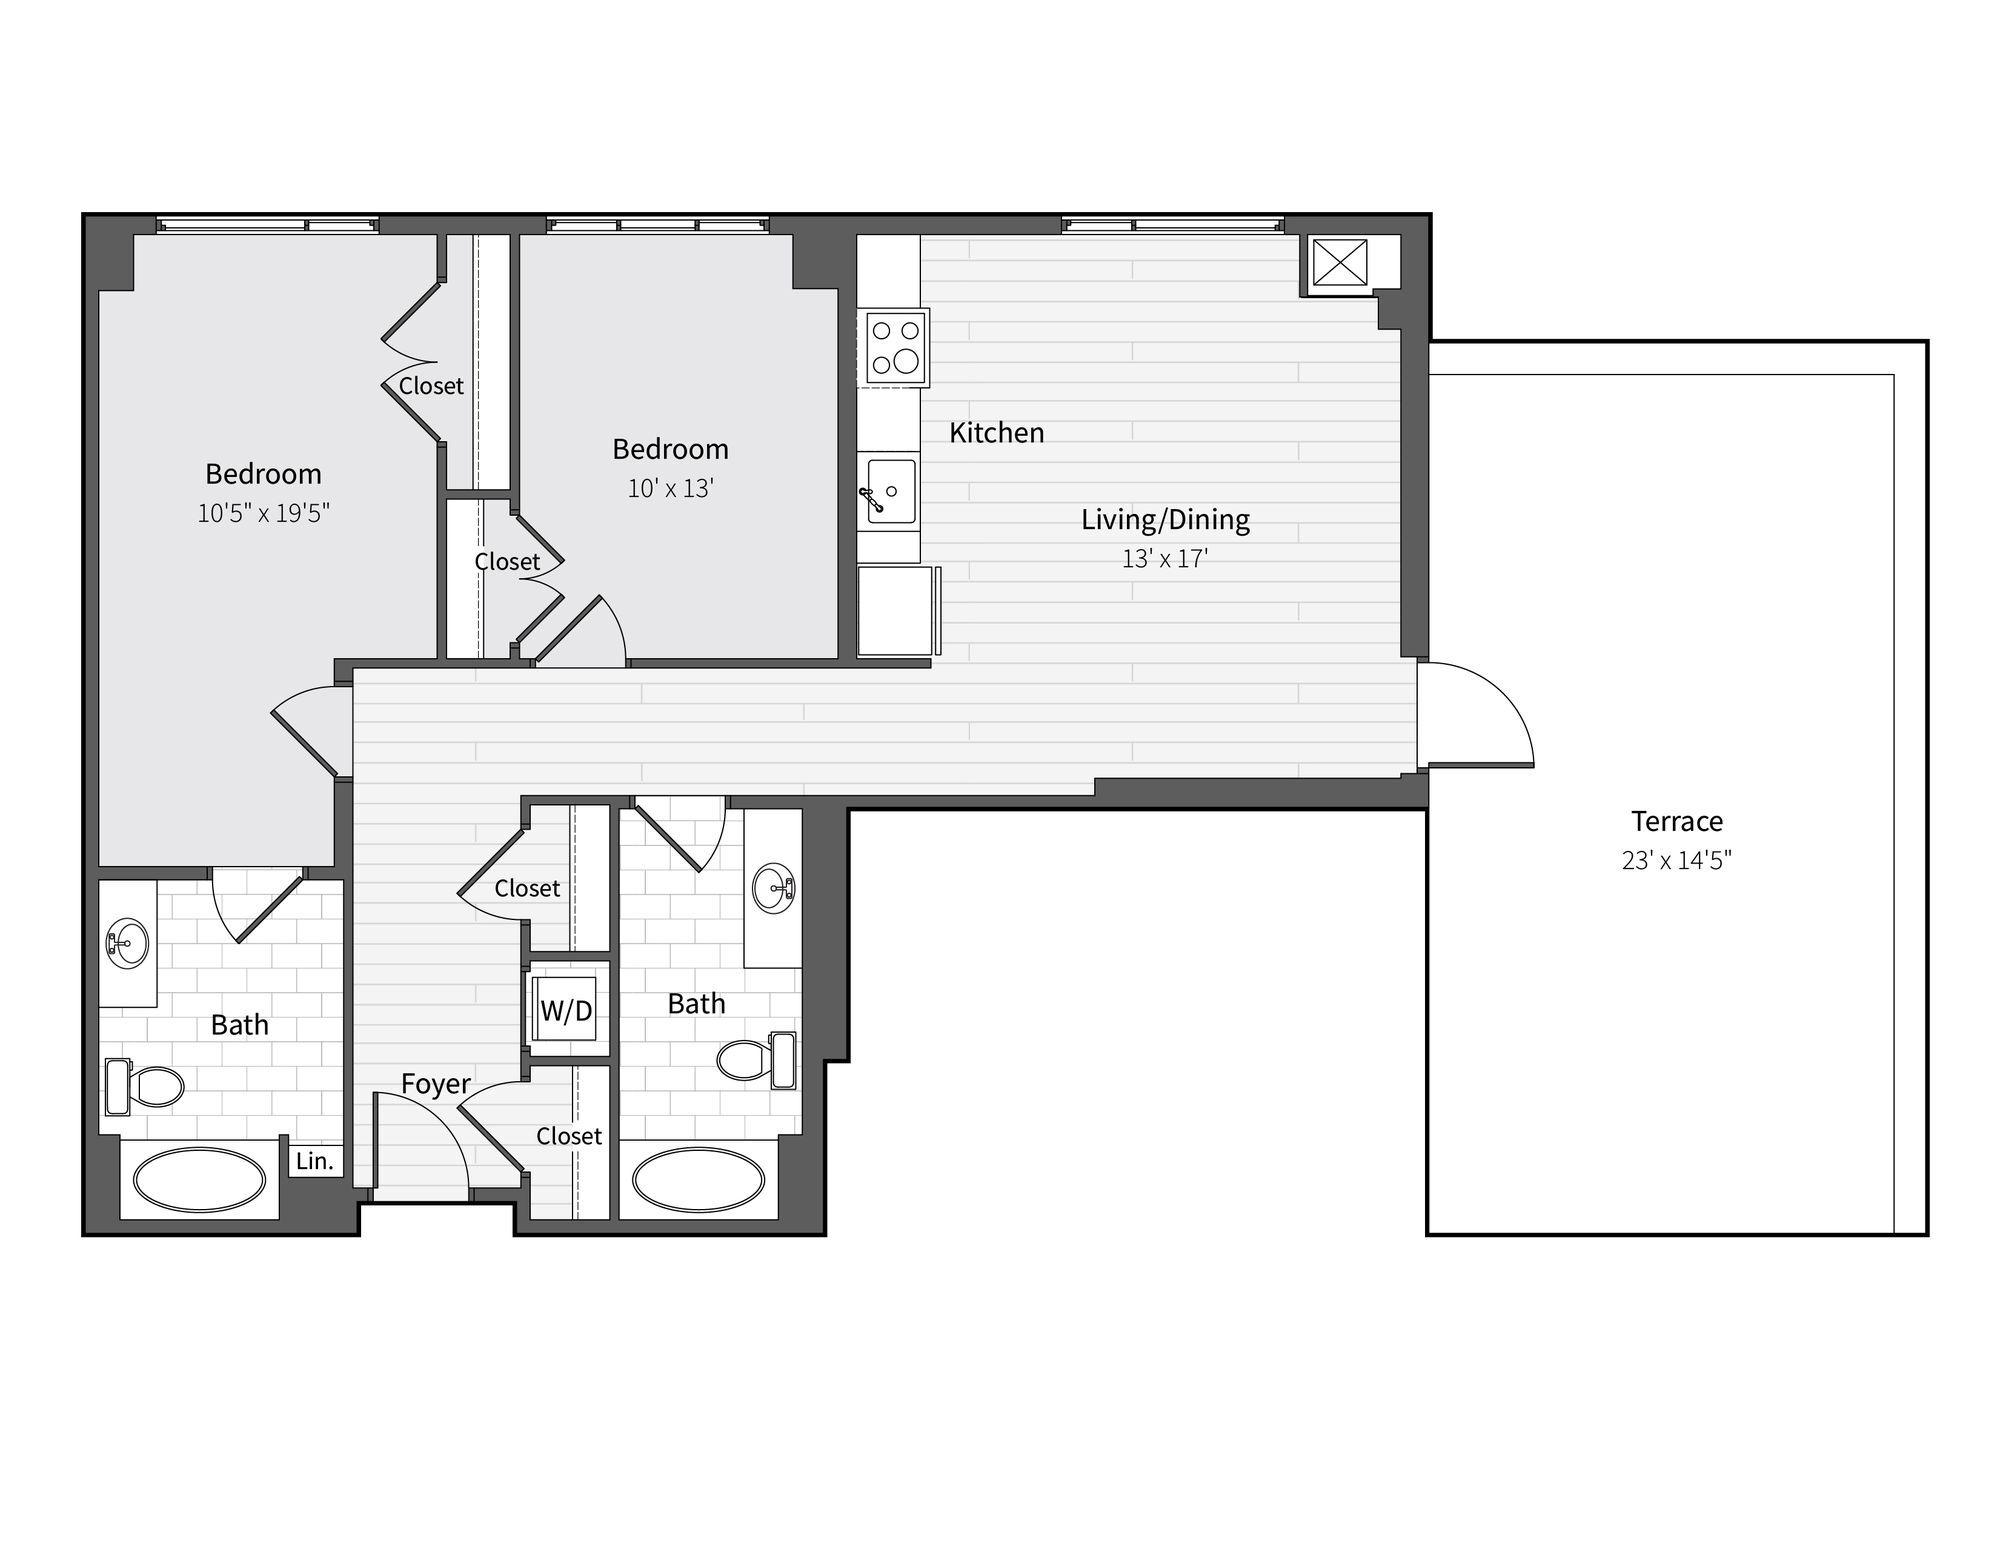 Apartment 724 floorplan